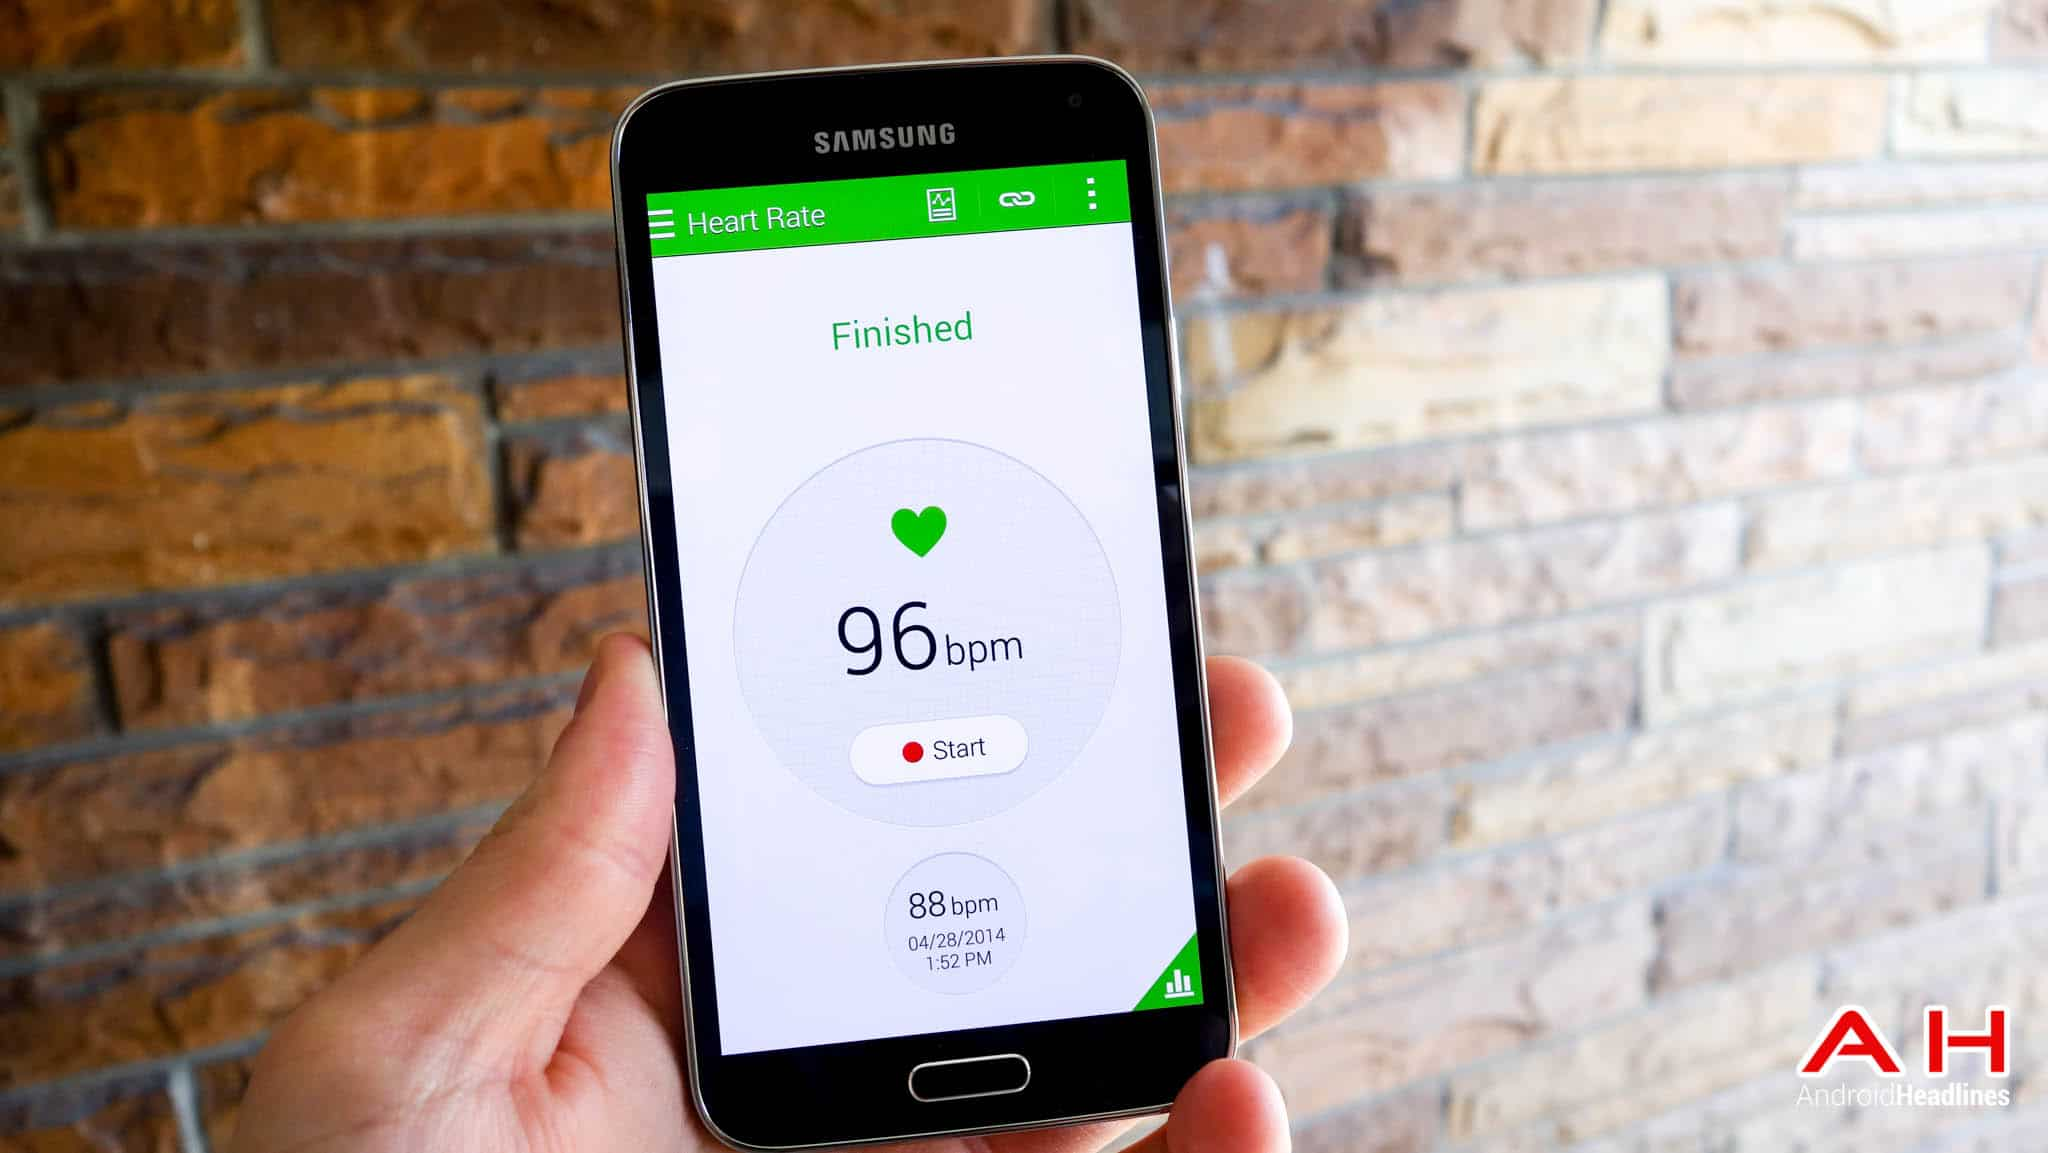 Samsung Galaxy S5 S Health Heart Rate AH 2